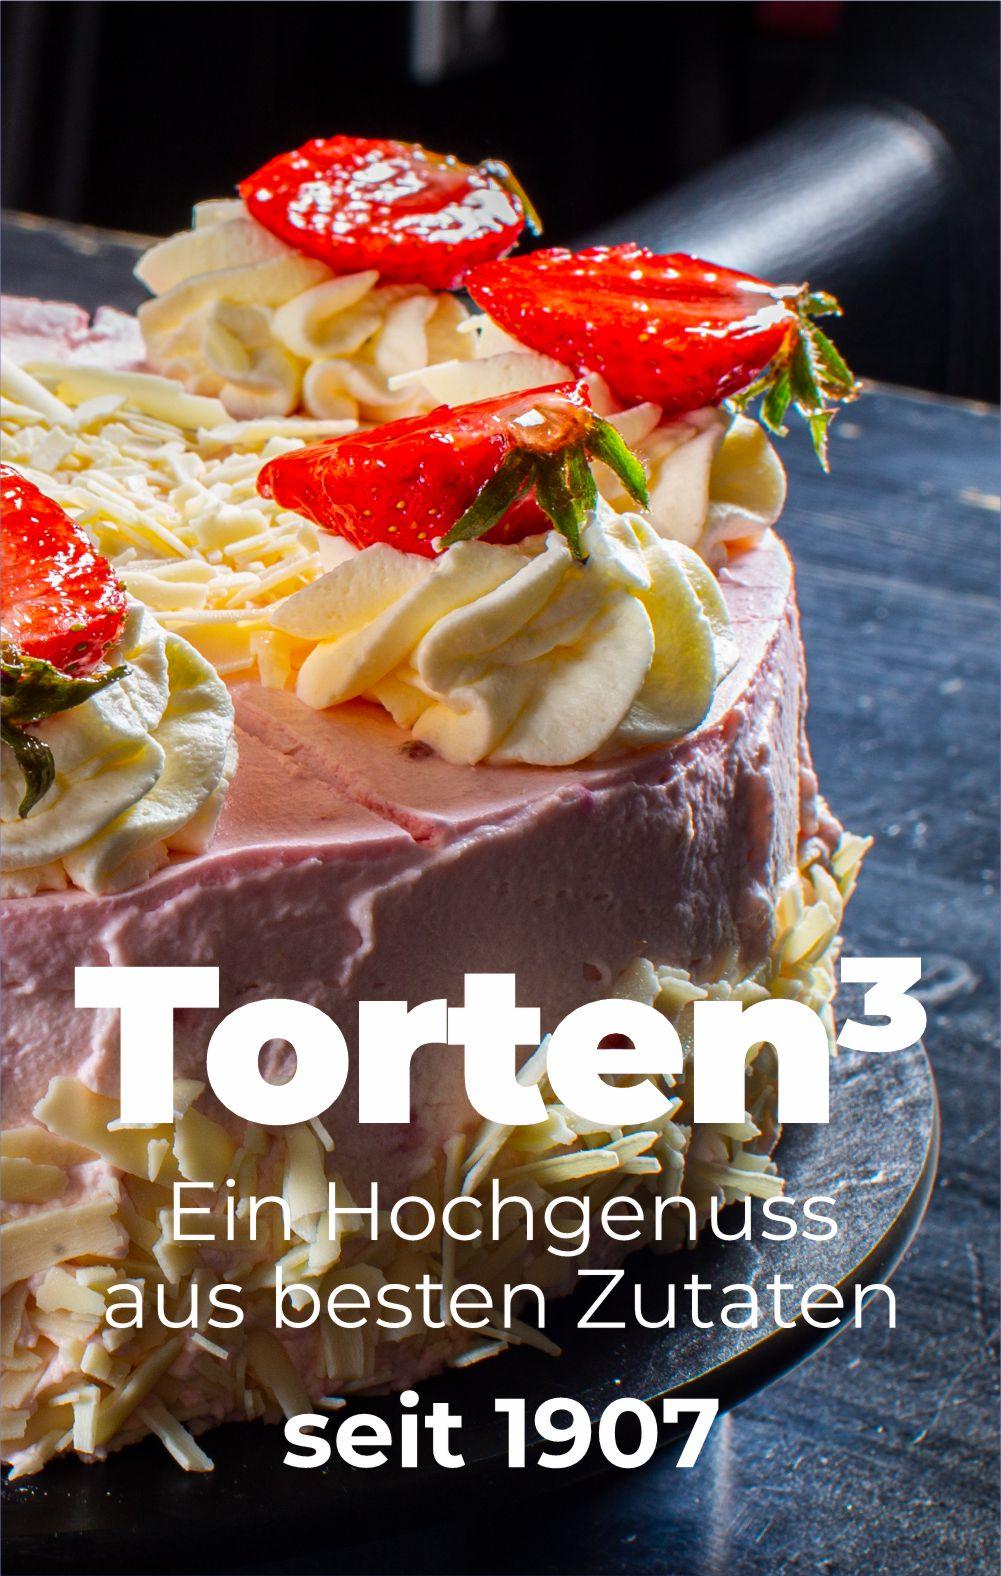 tismes_torten_006_xs